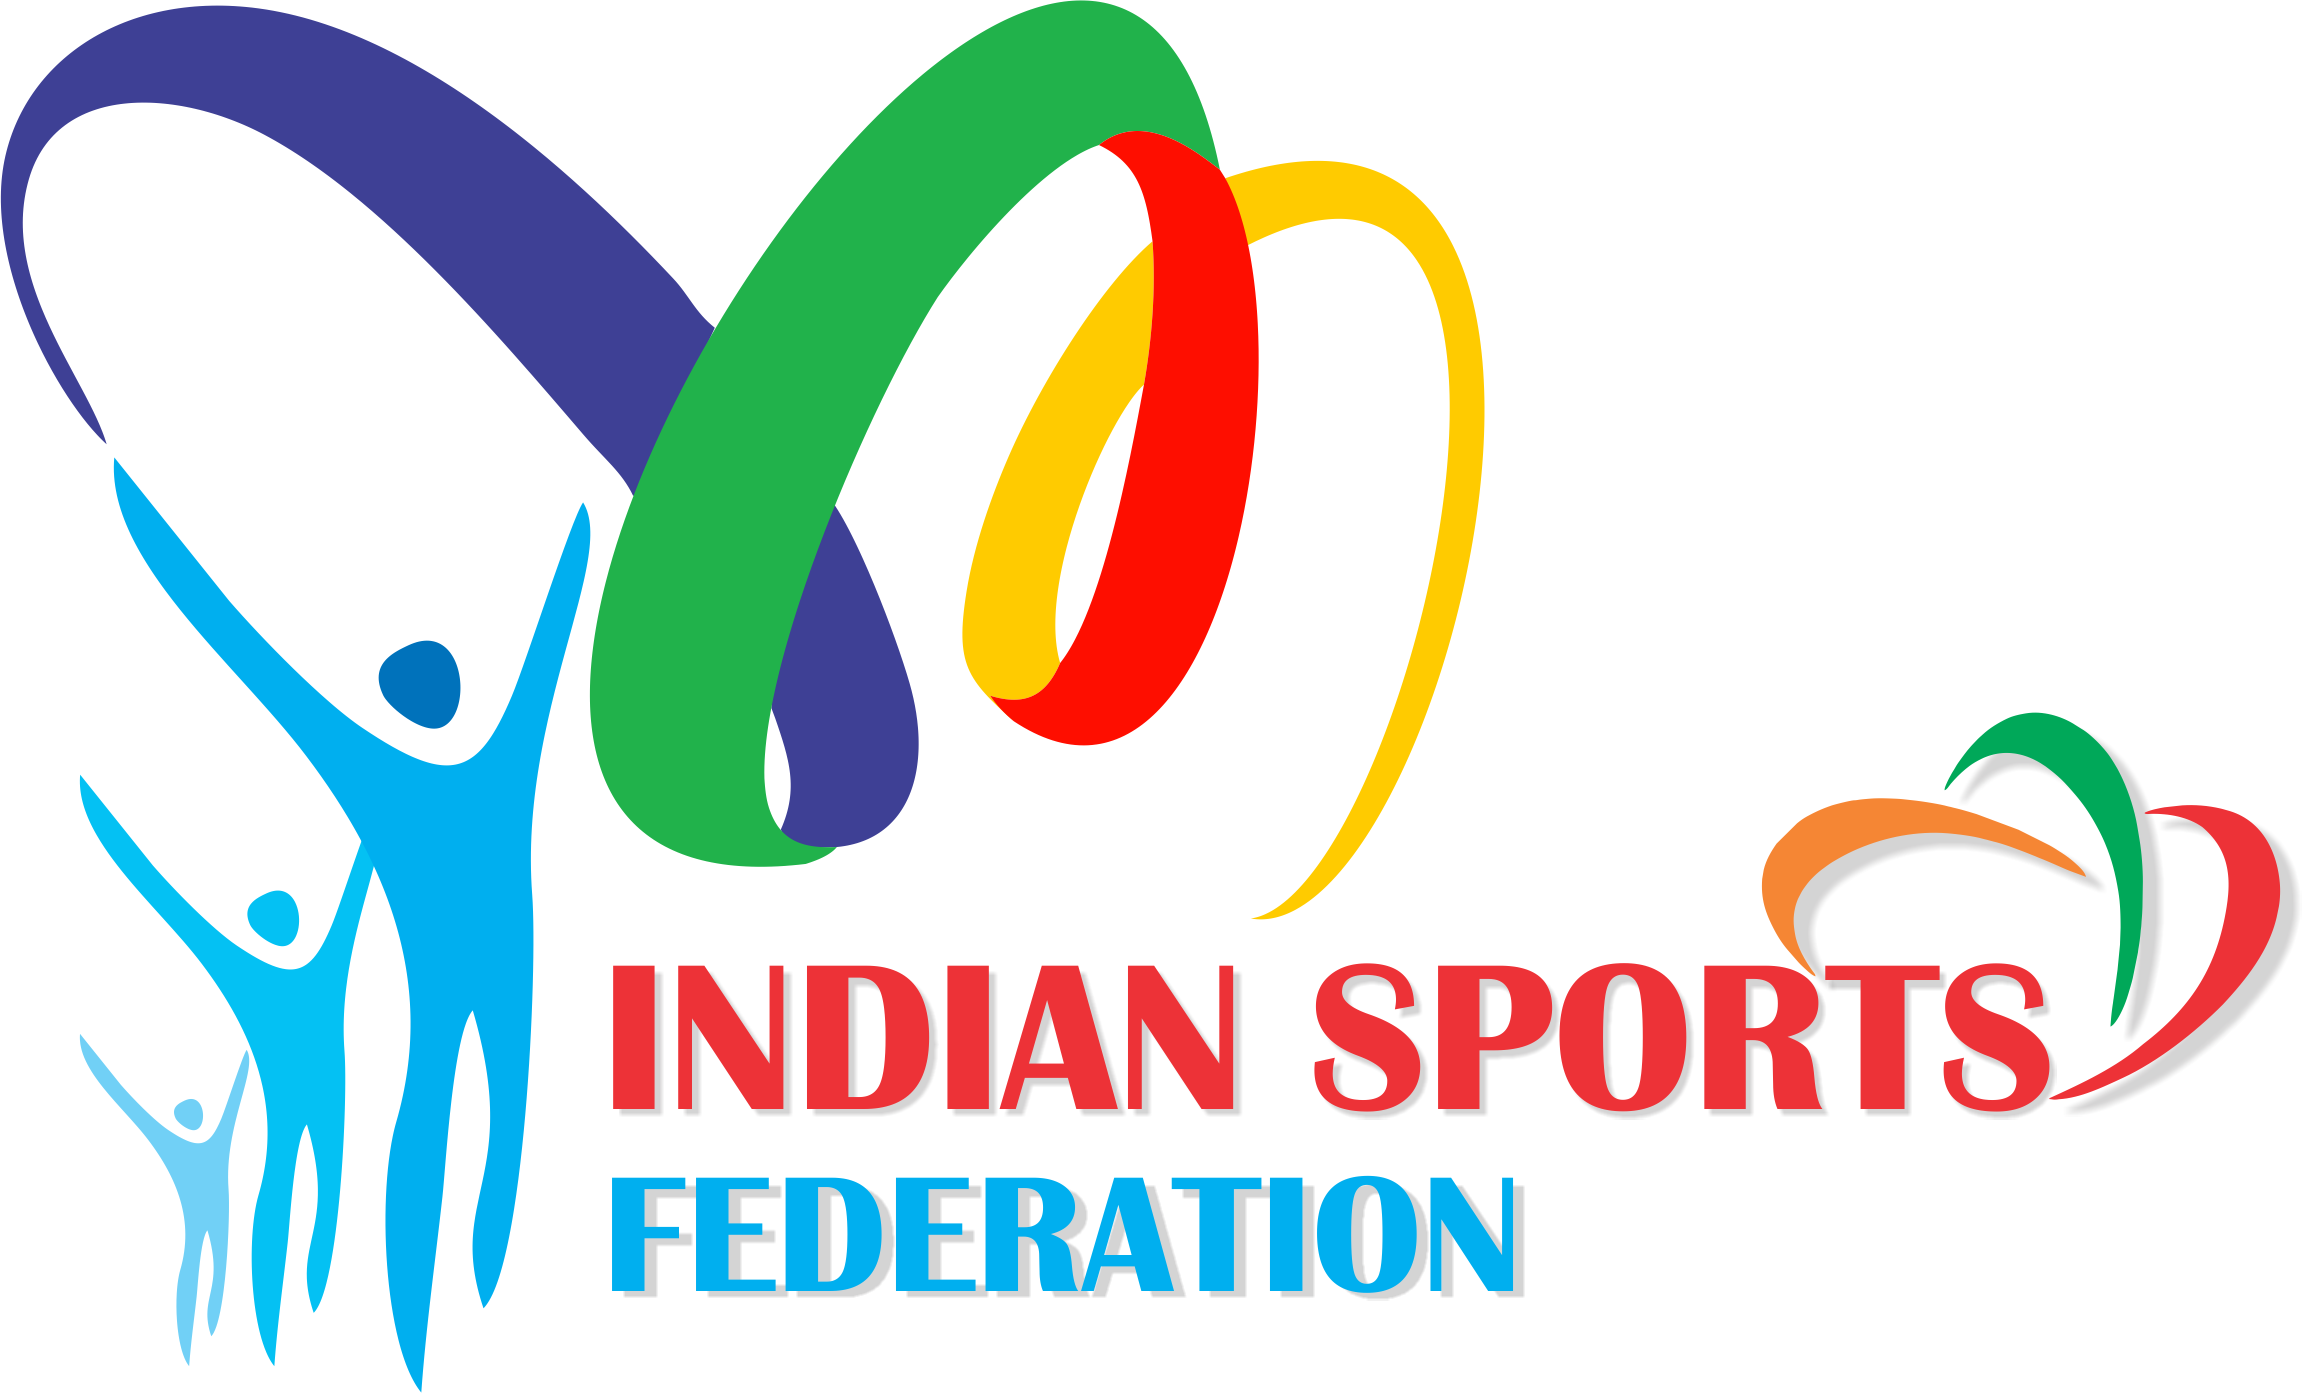 Indian Sports Federation KreedOn